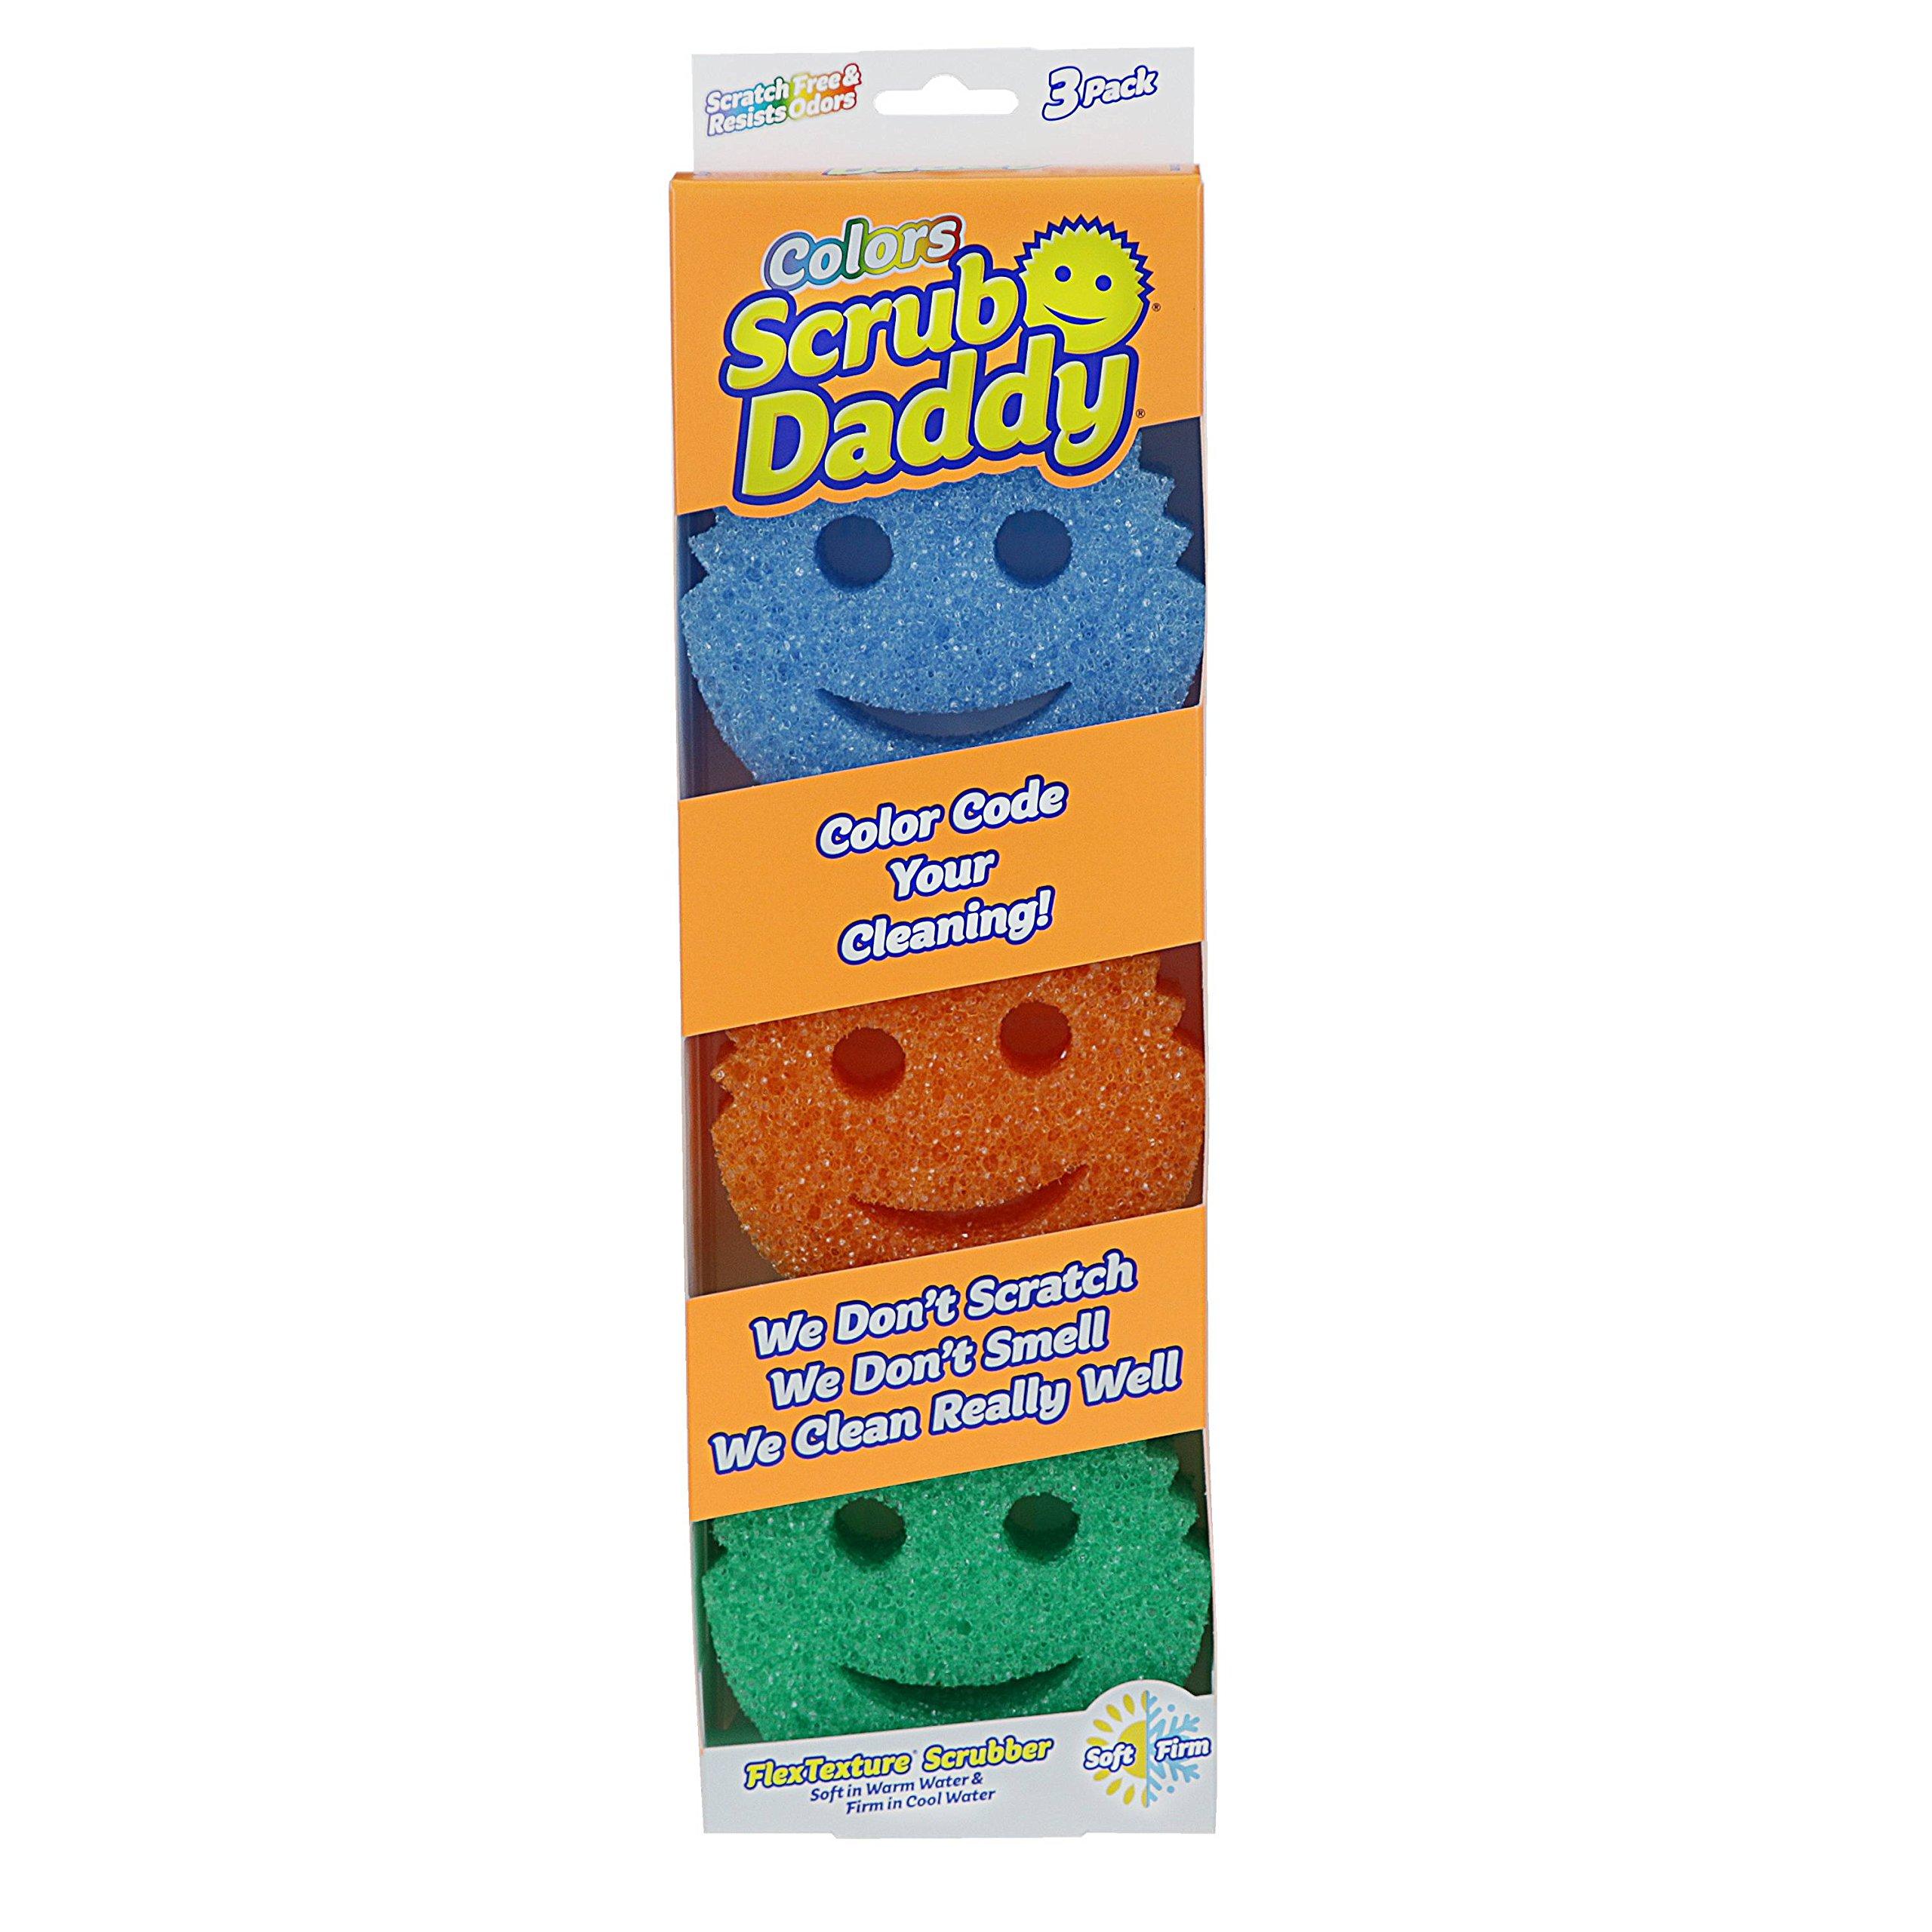 Scrub Daddy Color Sponge, Value Size 4 Pack hjp( Total 12 Ct . )